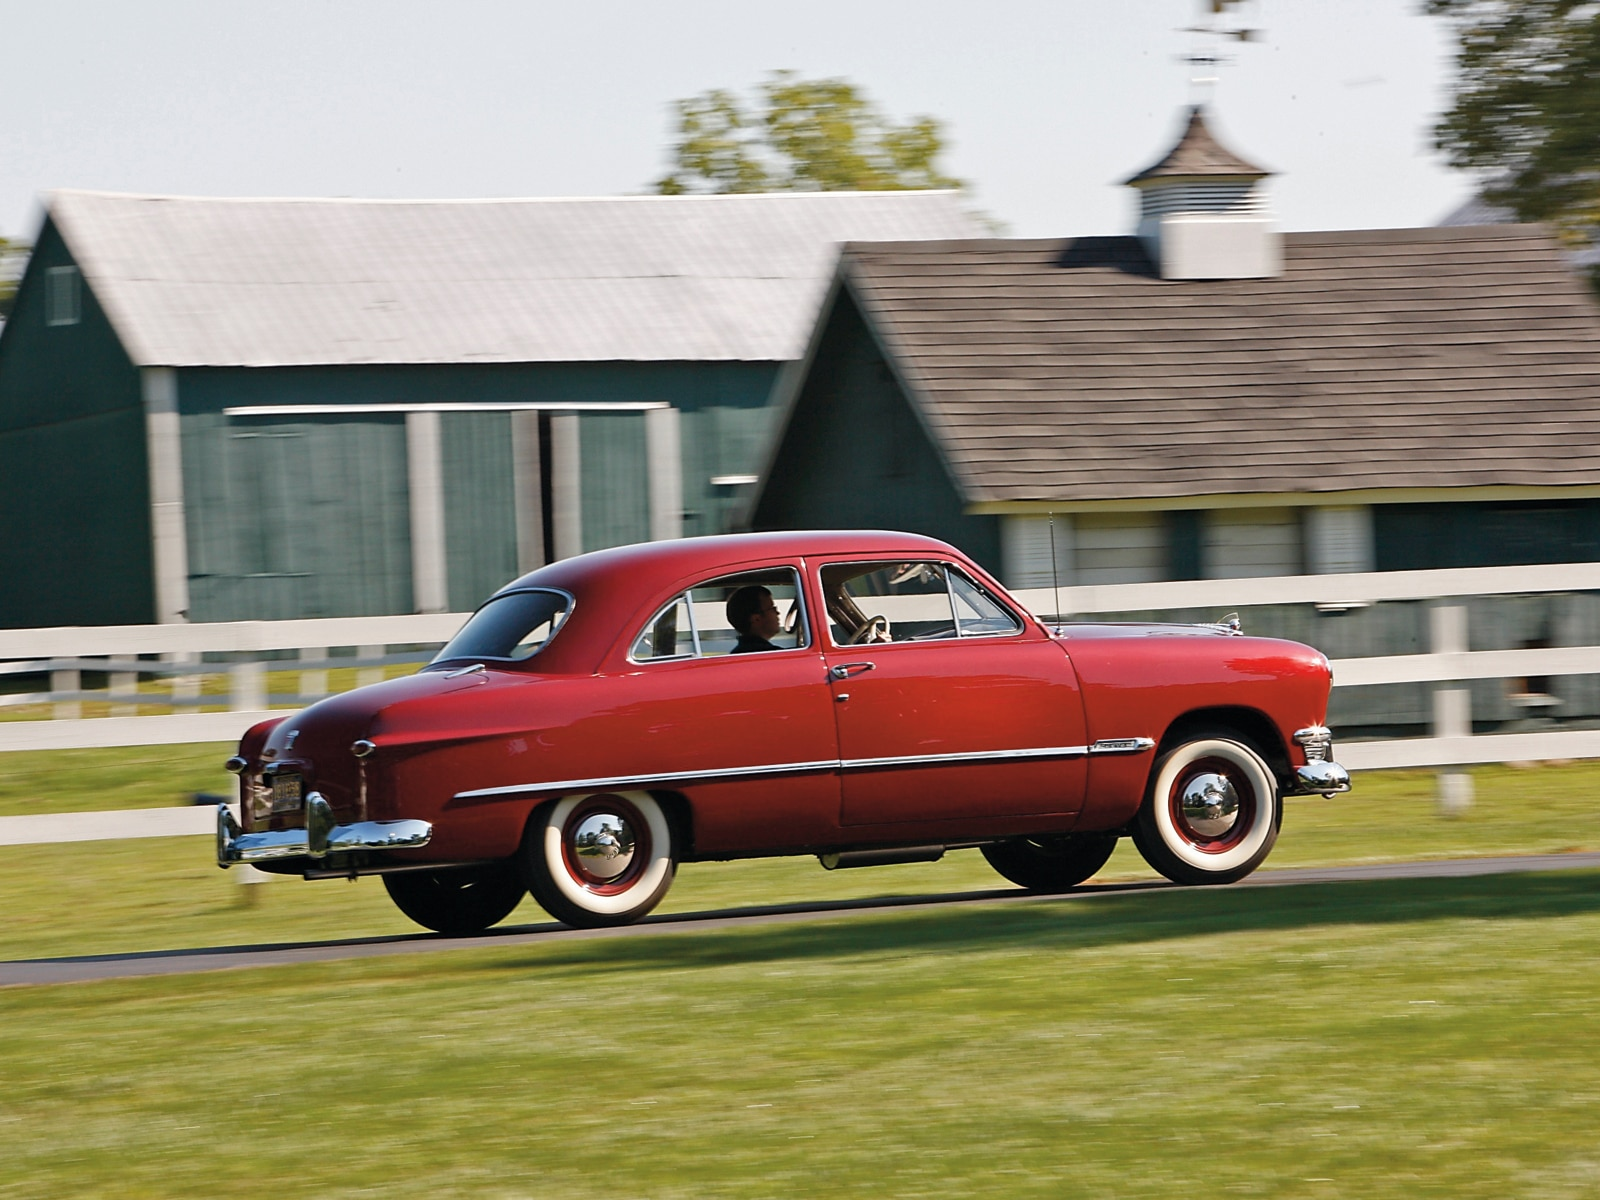 1949 1951 Ford 1950 Ford Tudor Sedan Collectible